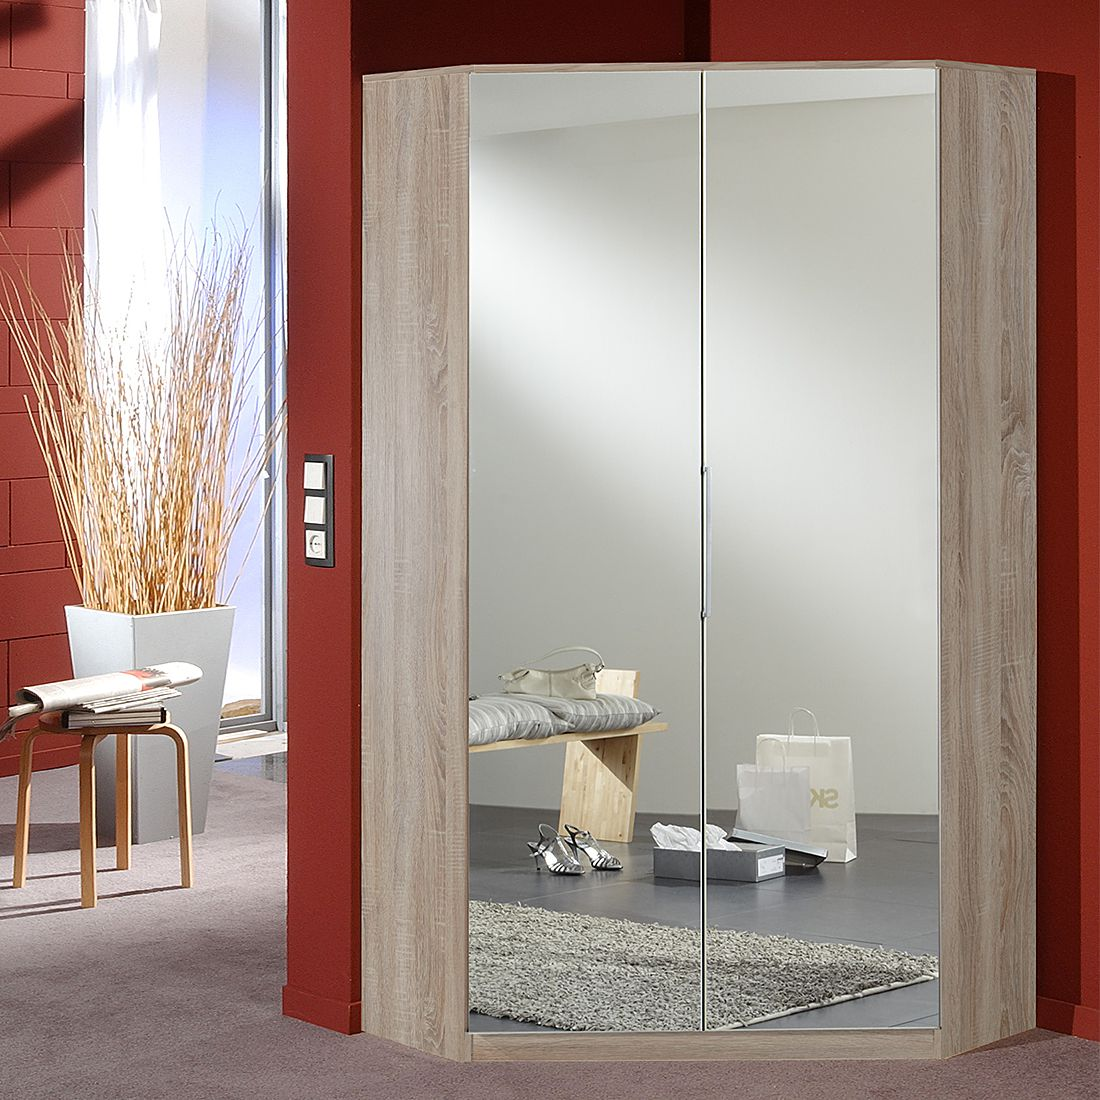 Armoire d'angle Soala (avec miroir)